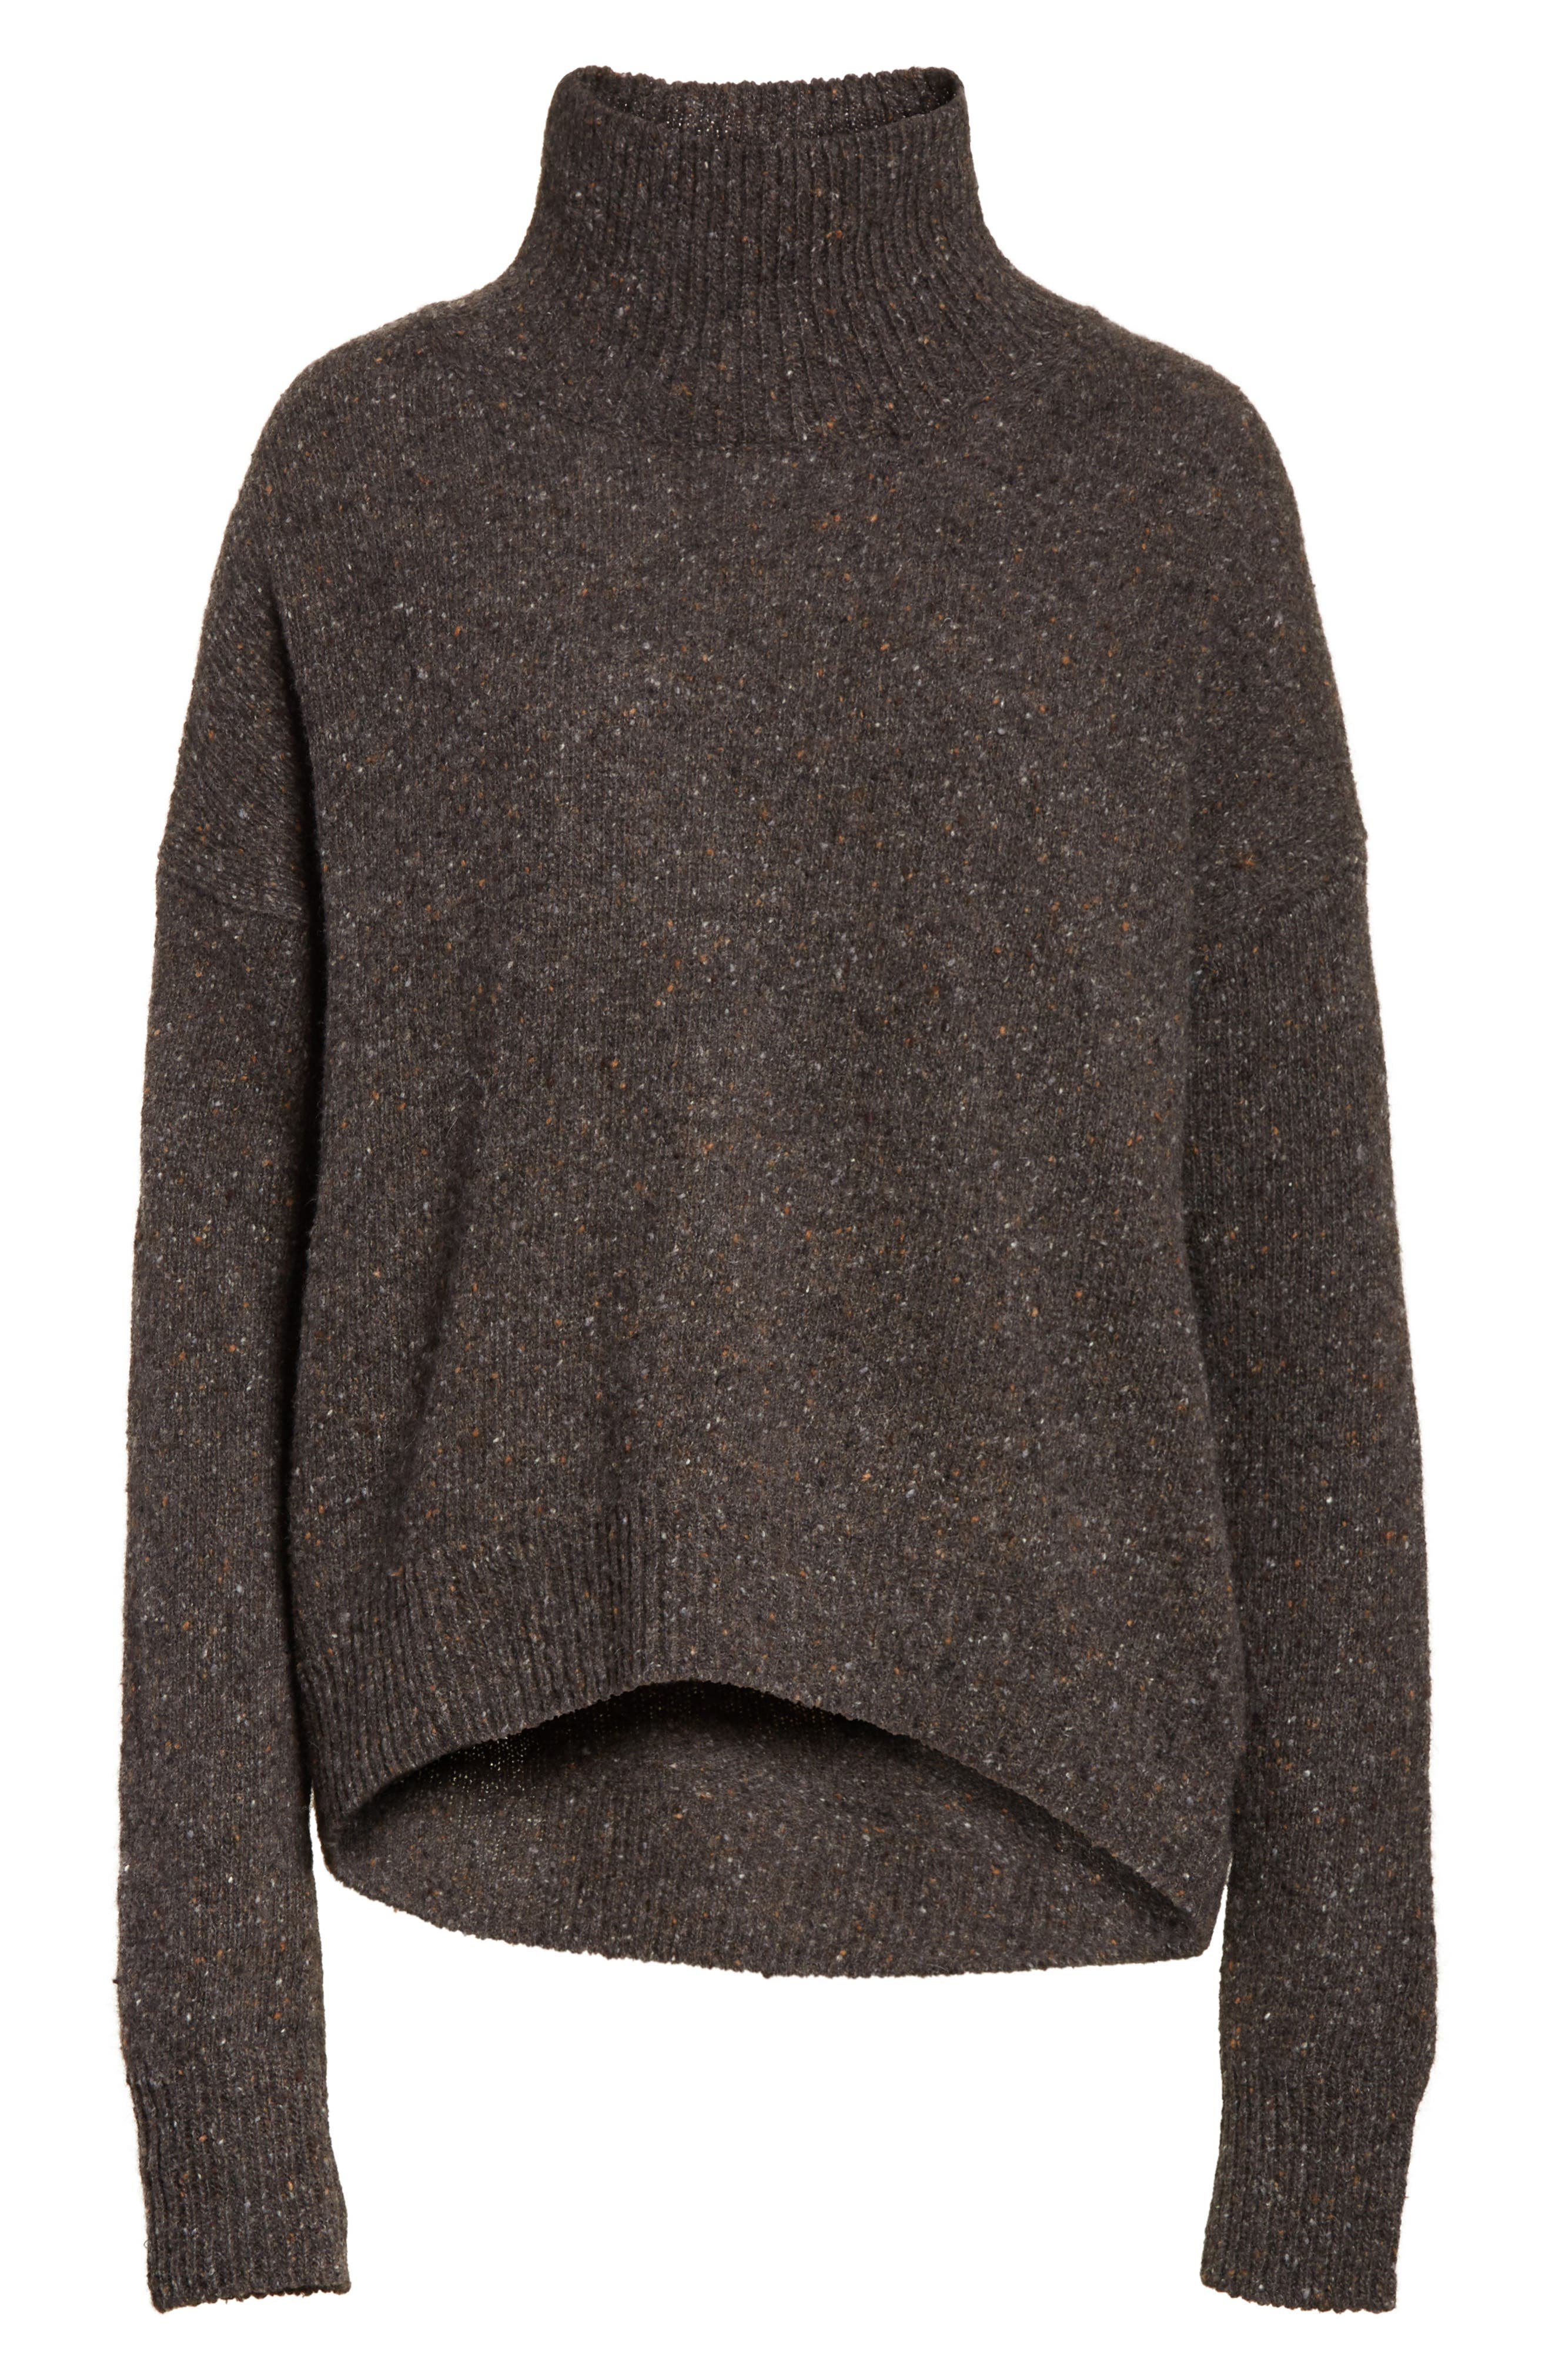 Cashmere Turtleneck Sweater,                             Alternate thumbnail 6, color,                             Charcoal